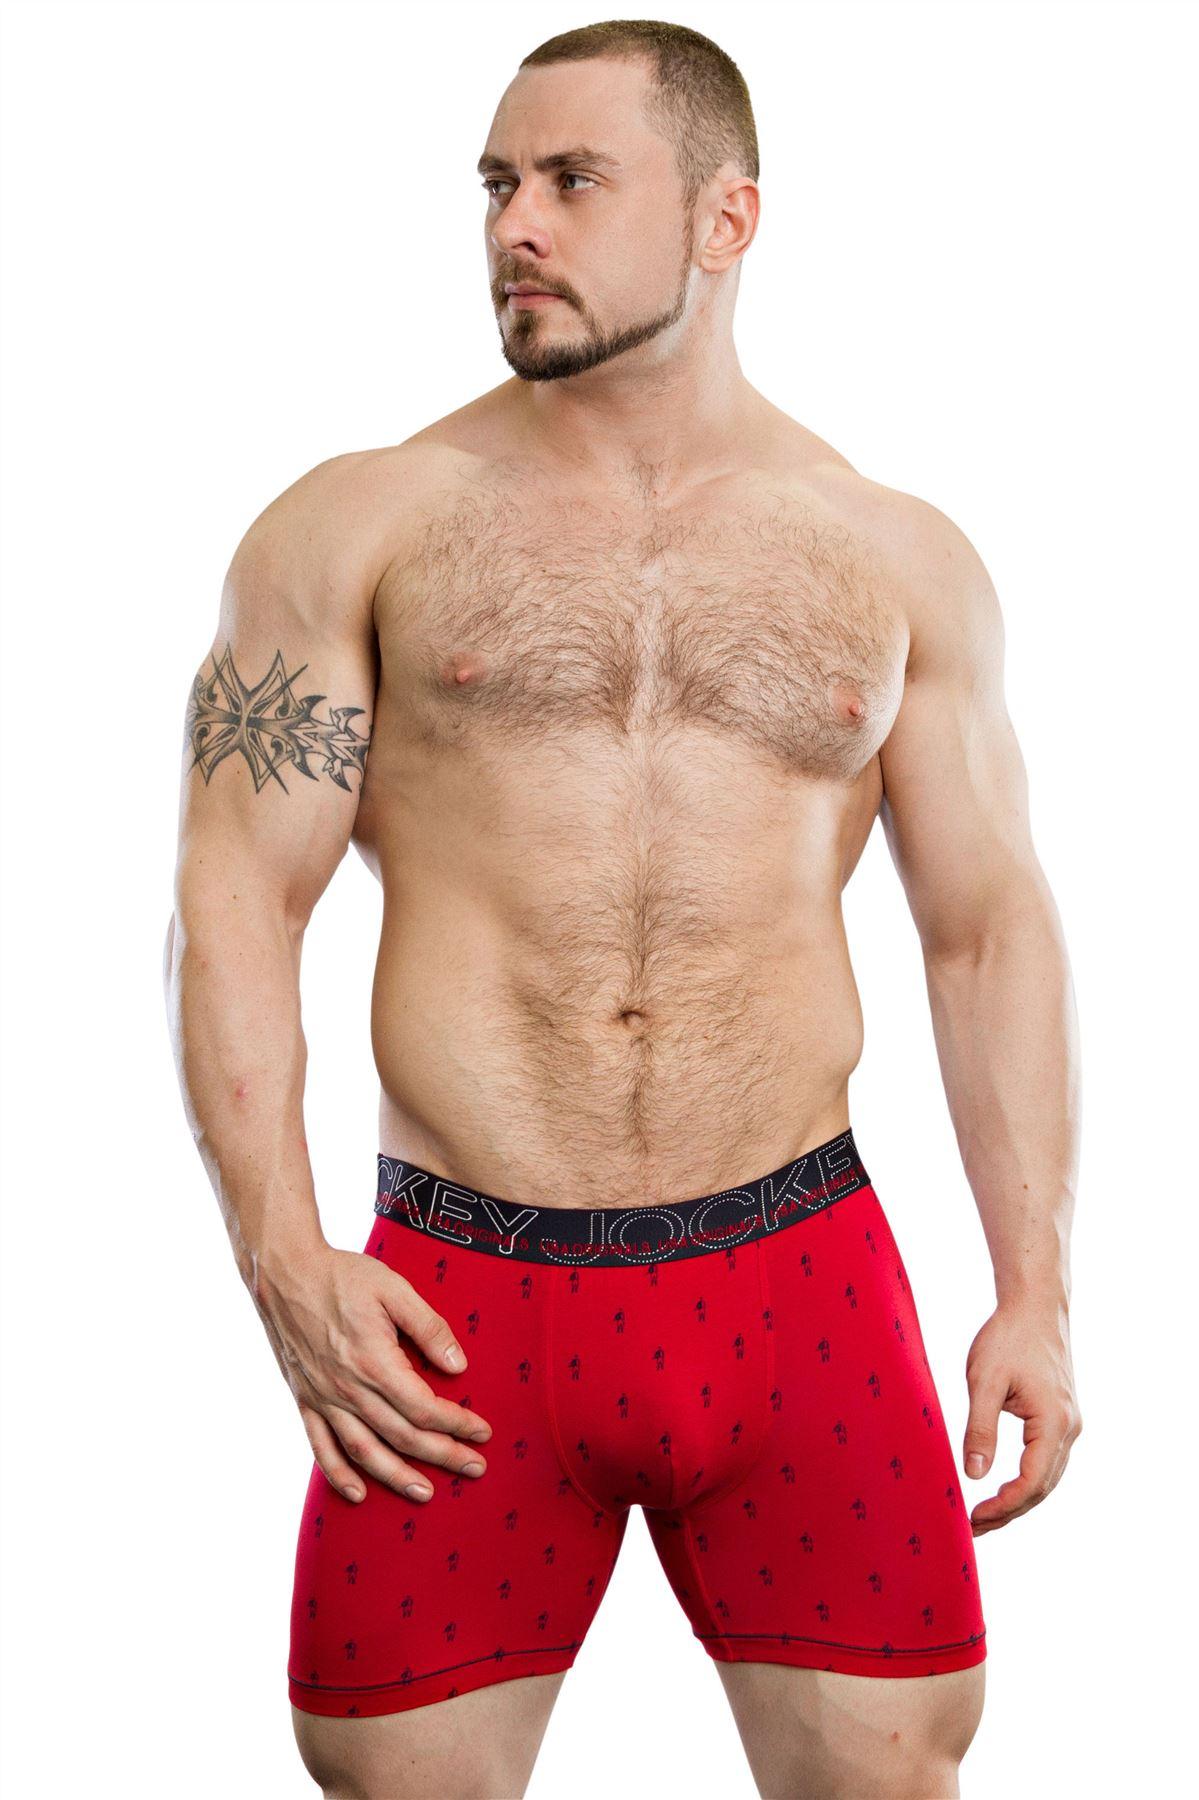 Jockey Men/'s Home Town Boxer Trunk Soft Cotton Modal Long Trunk Underwear